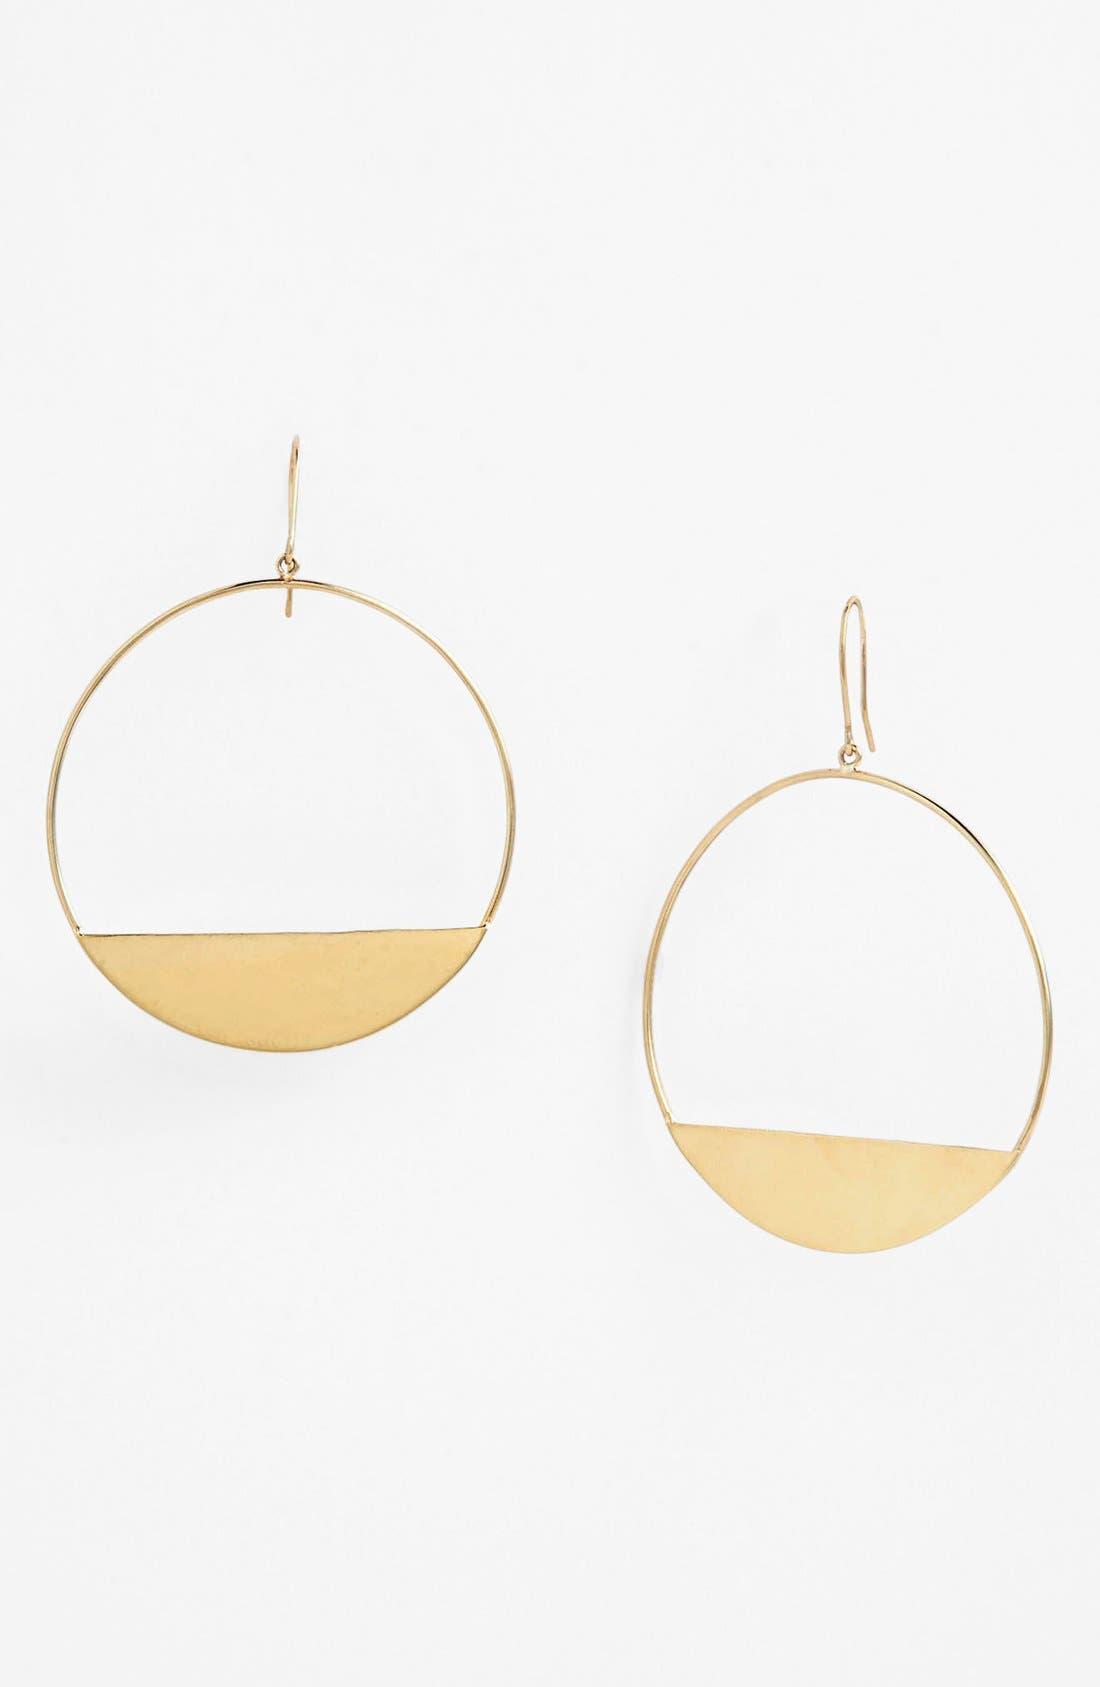 Main Image - Lana Jewelry Medium Eclipse Earrings